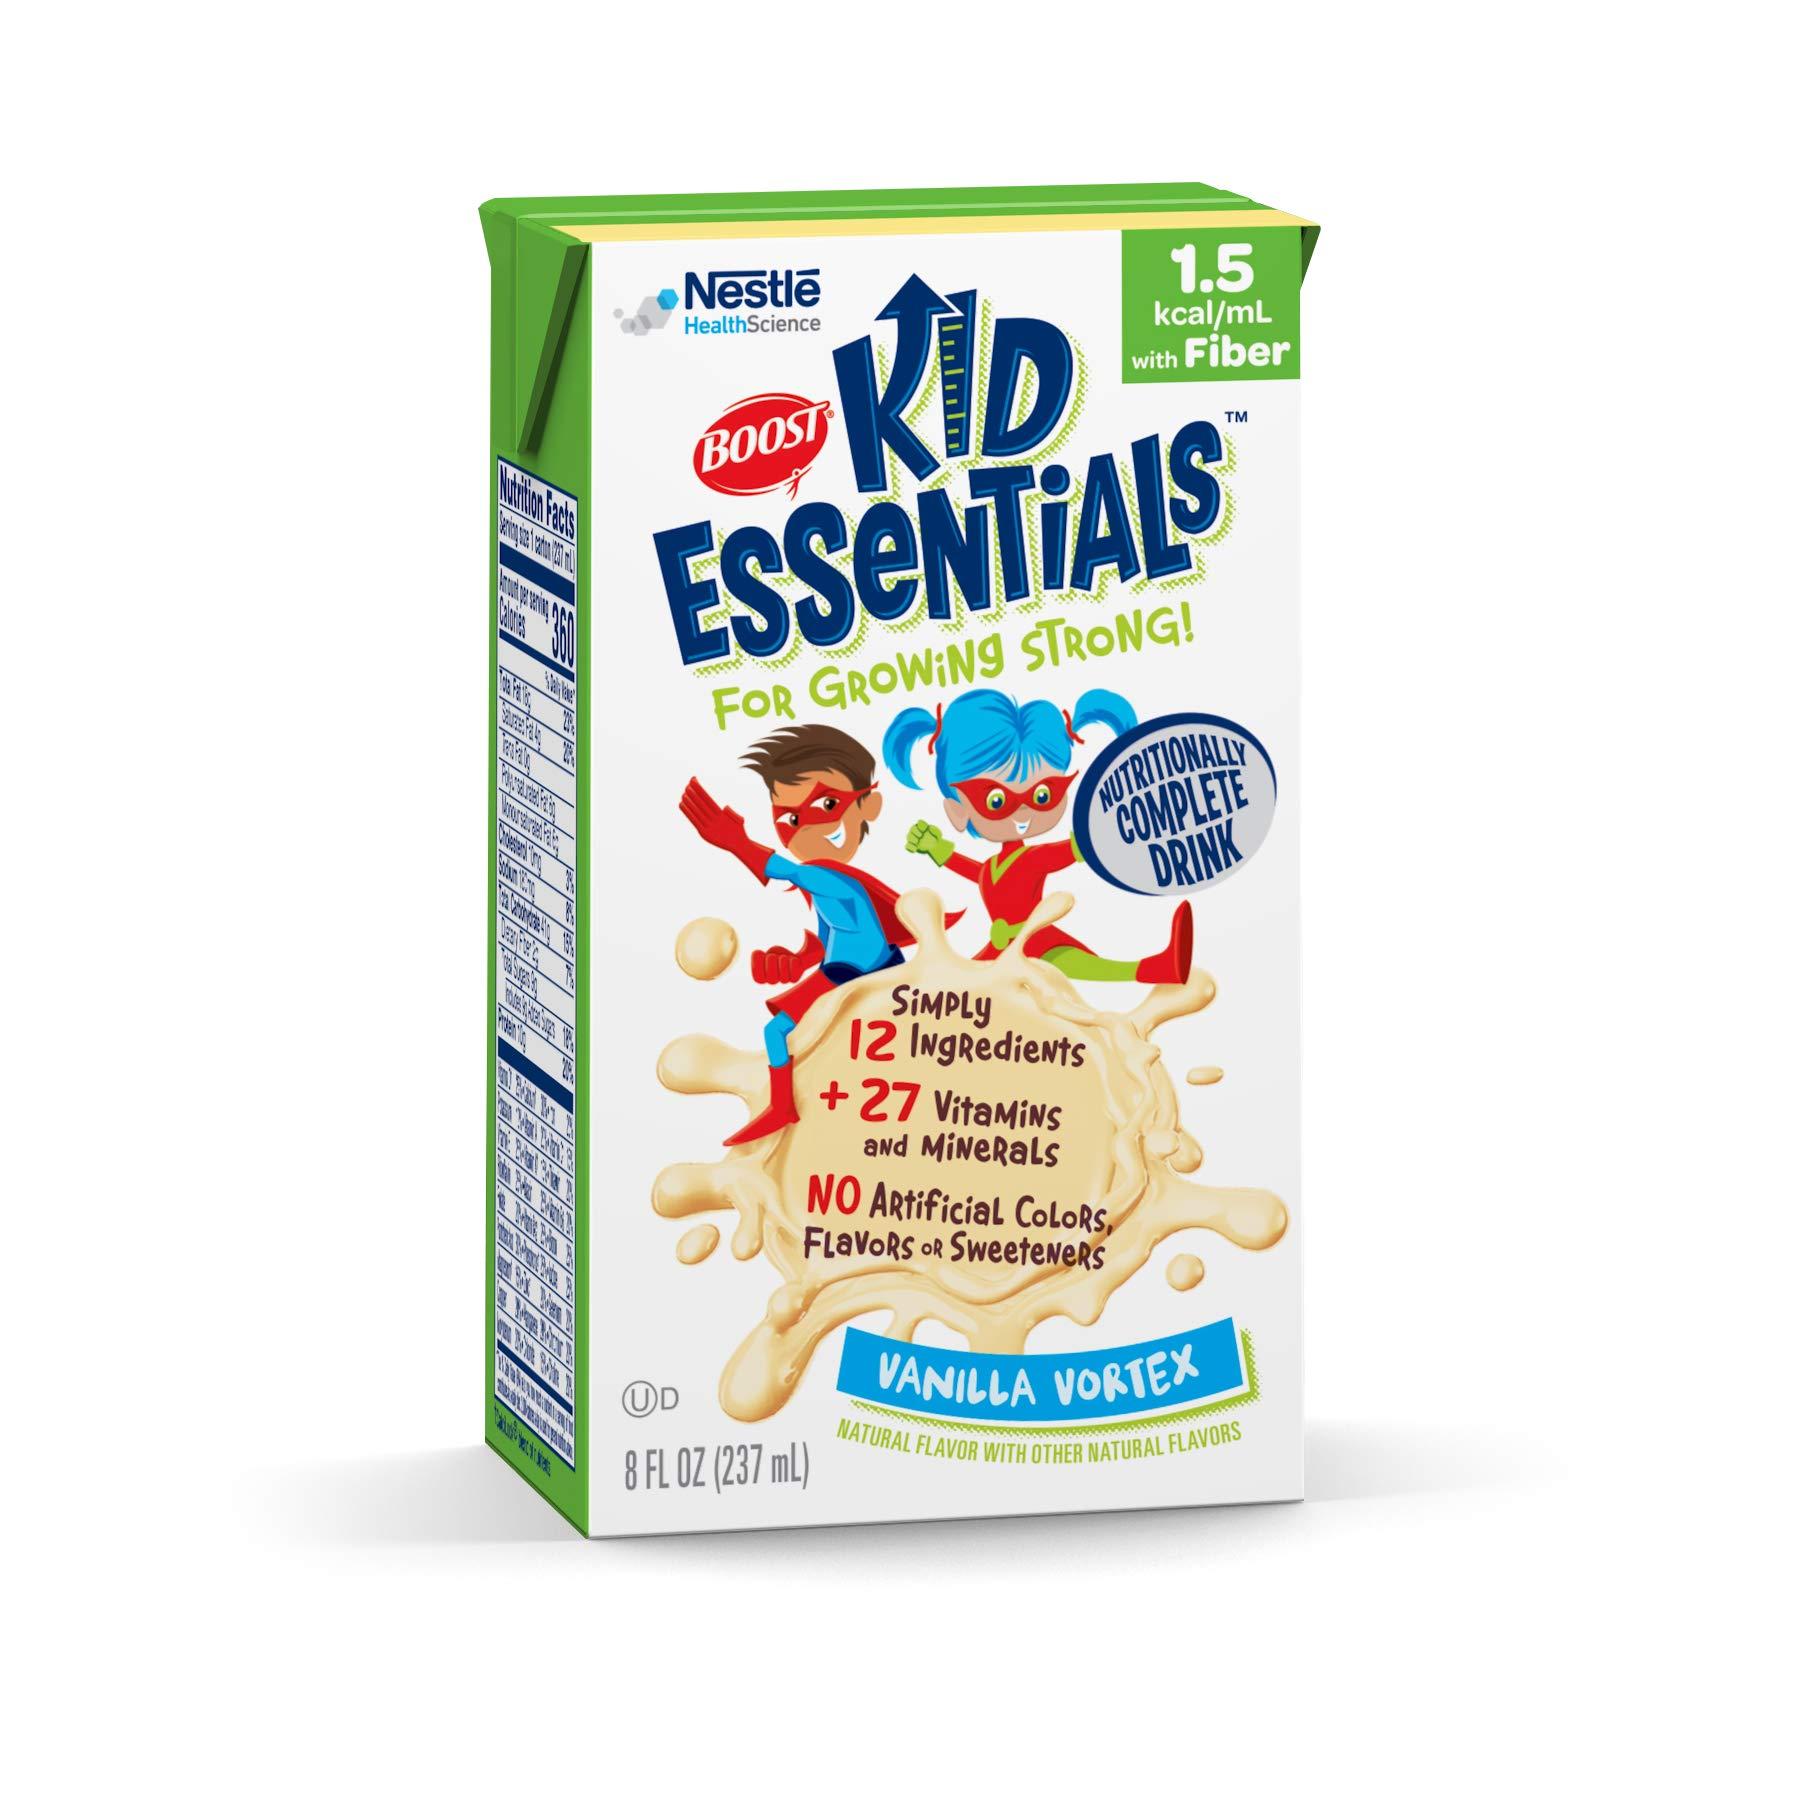 Boost Kid Essentials 1.5 Nutritionally Complete Drink, Vanilla Vortex, 8 Ounce, Pack of 27 by Boost Kids Essentials (Image #1)